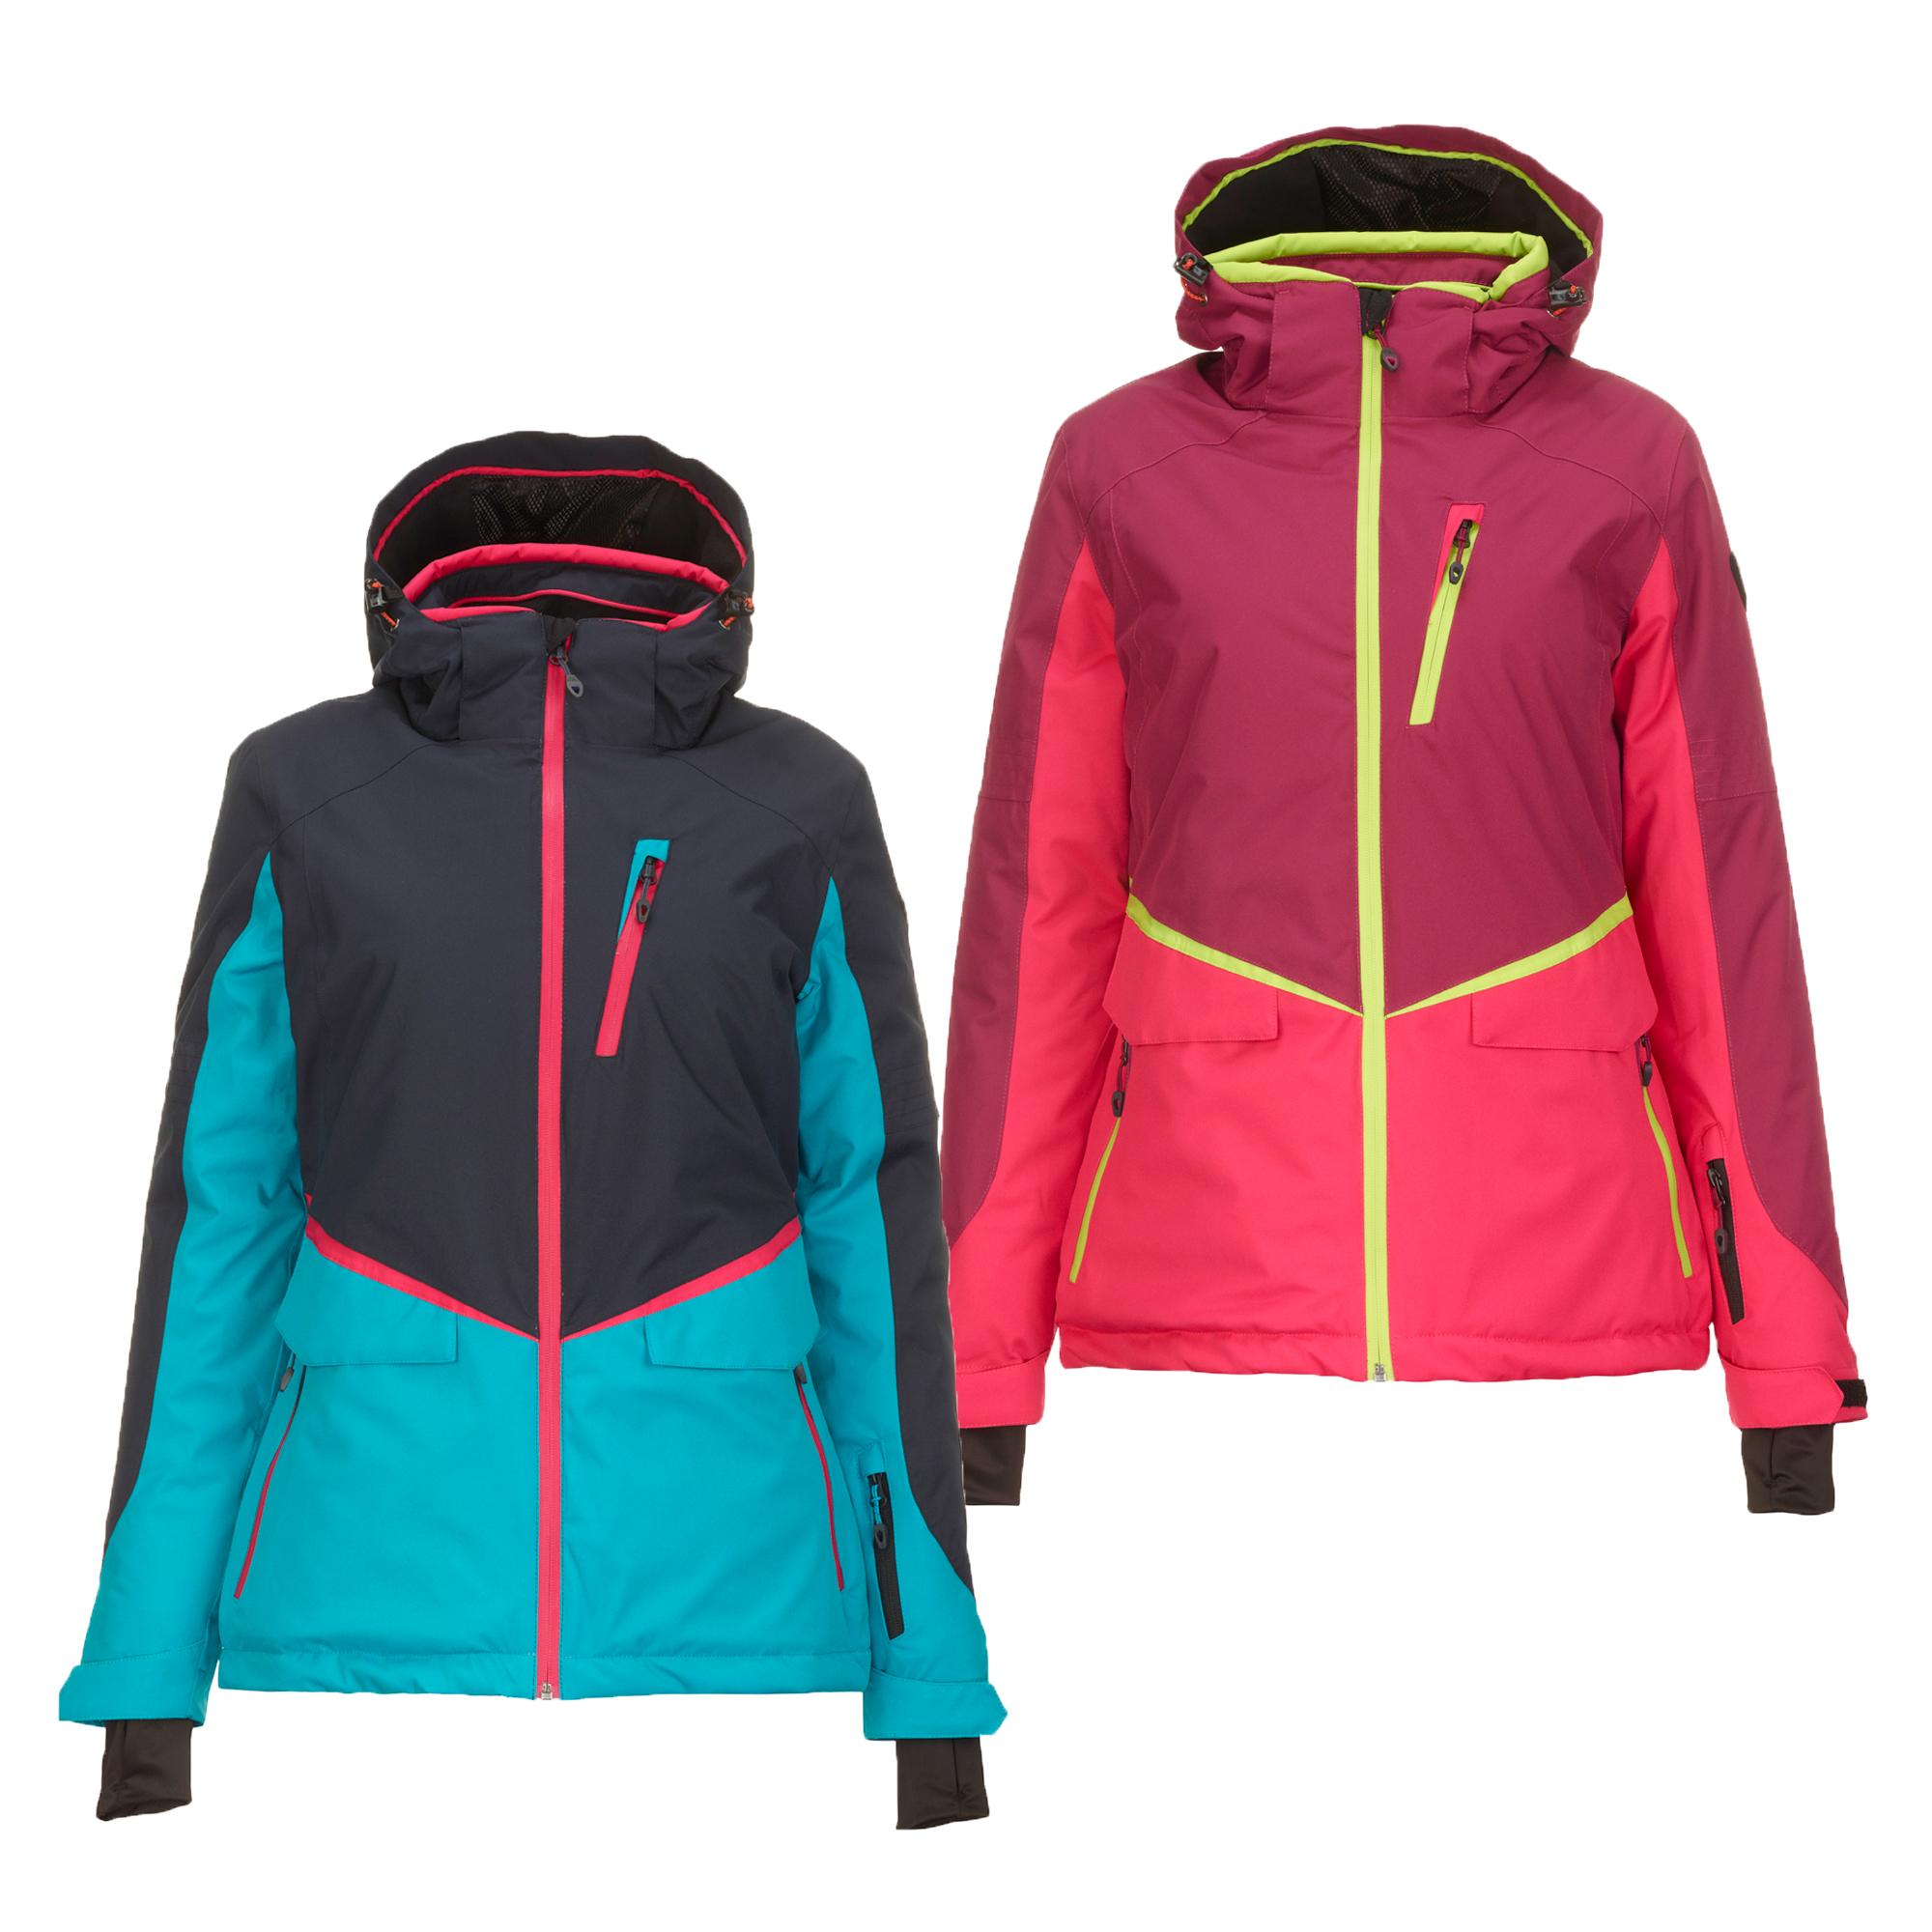 Details about Killtec dorya Ladies Ski Jacket Winter Jacket Functional Jacket show original title